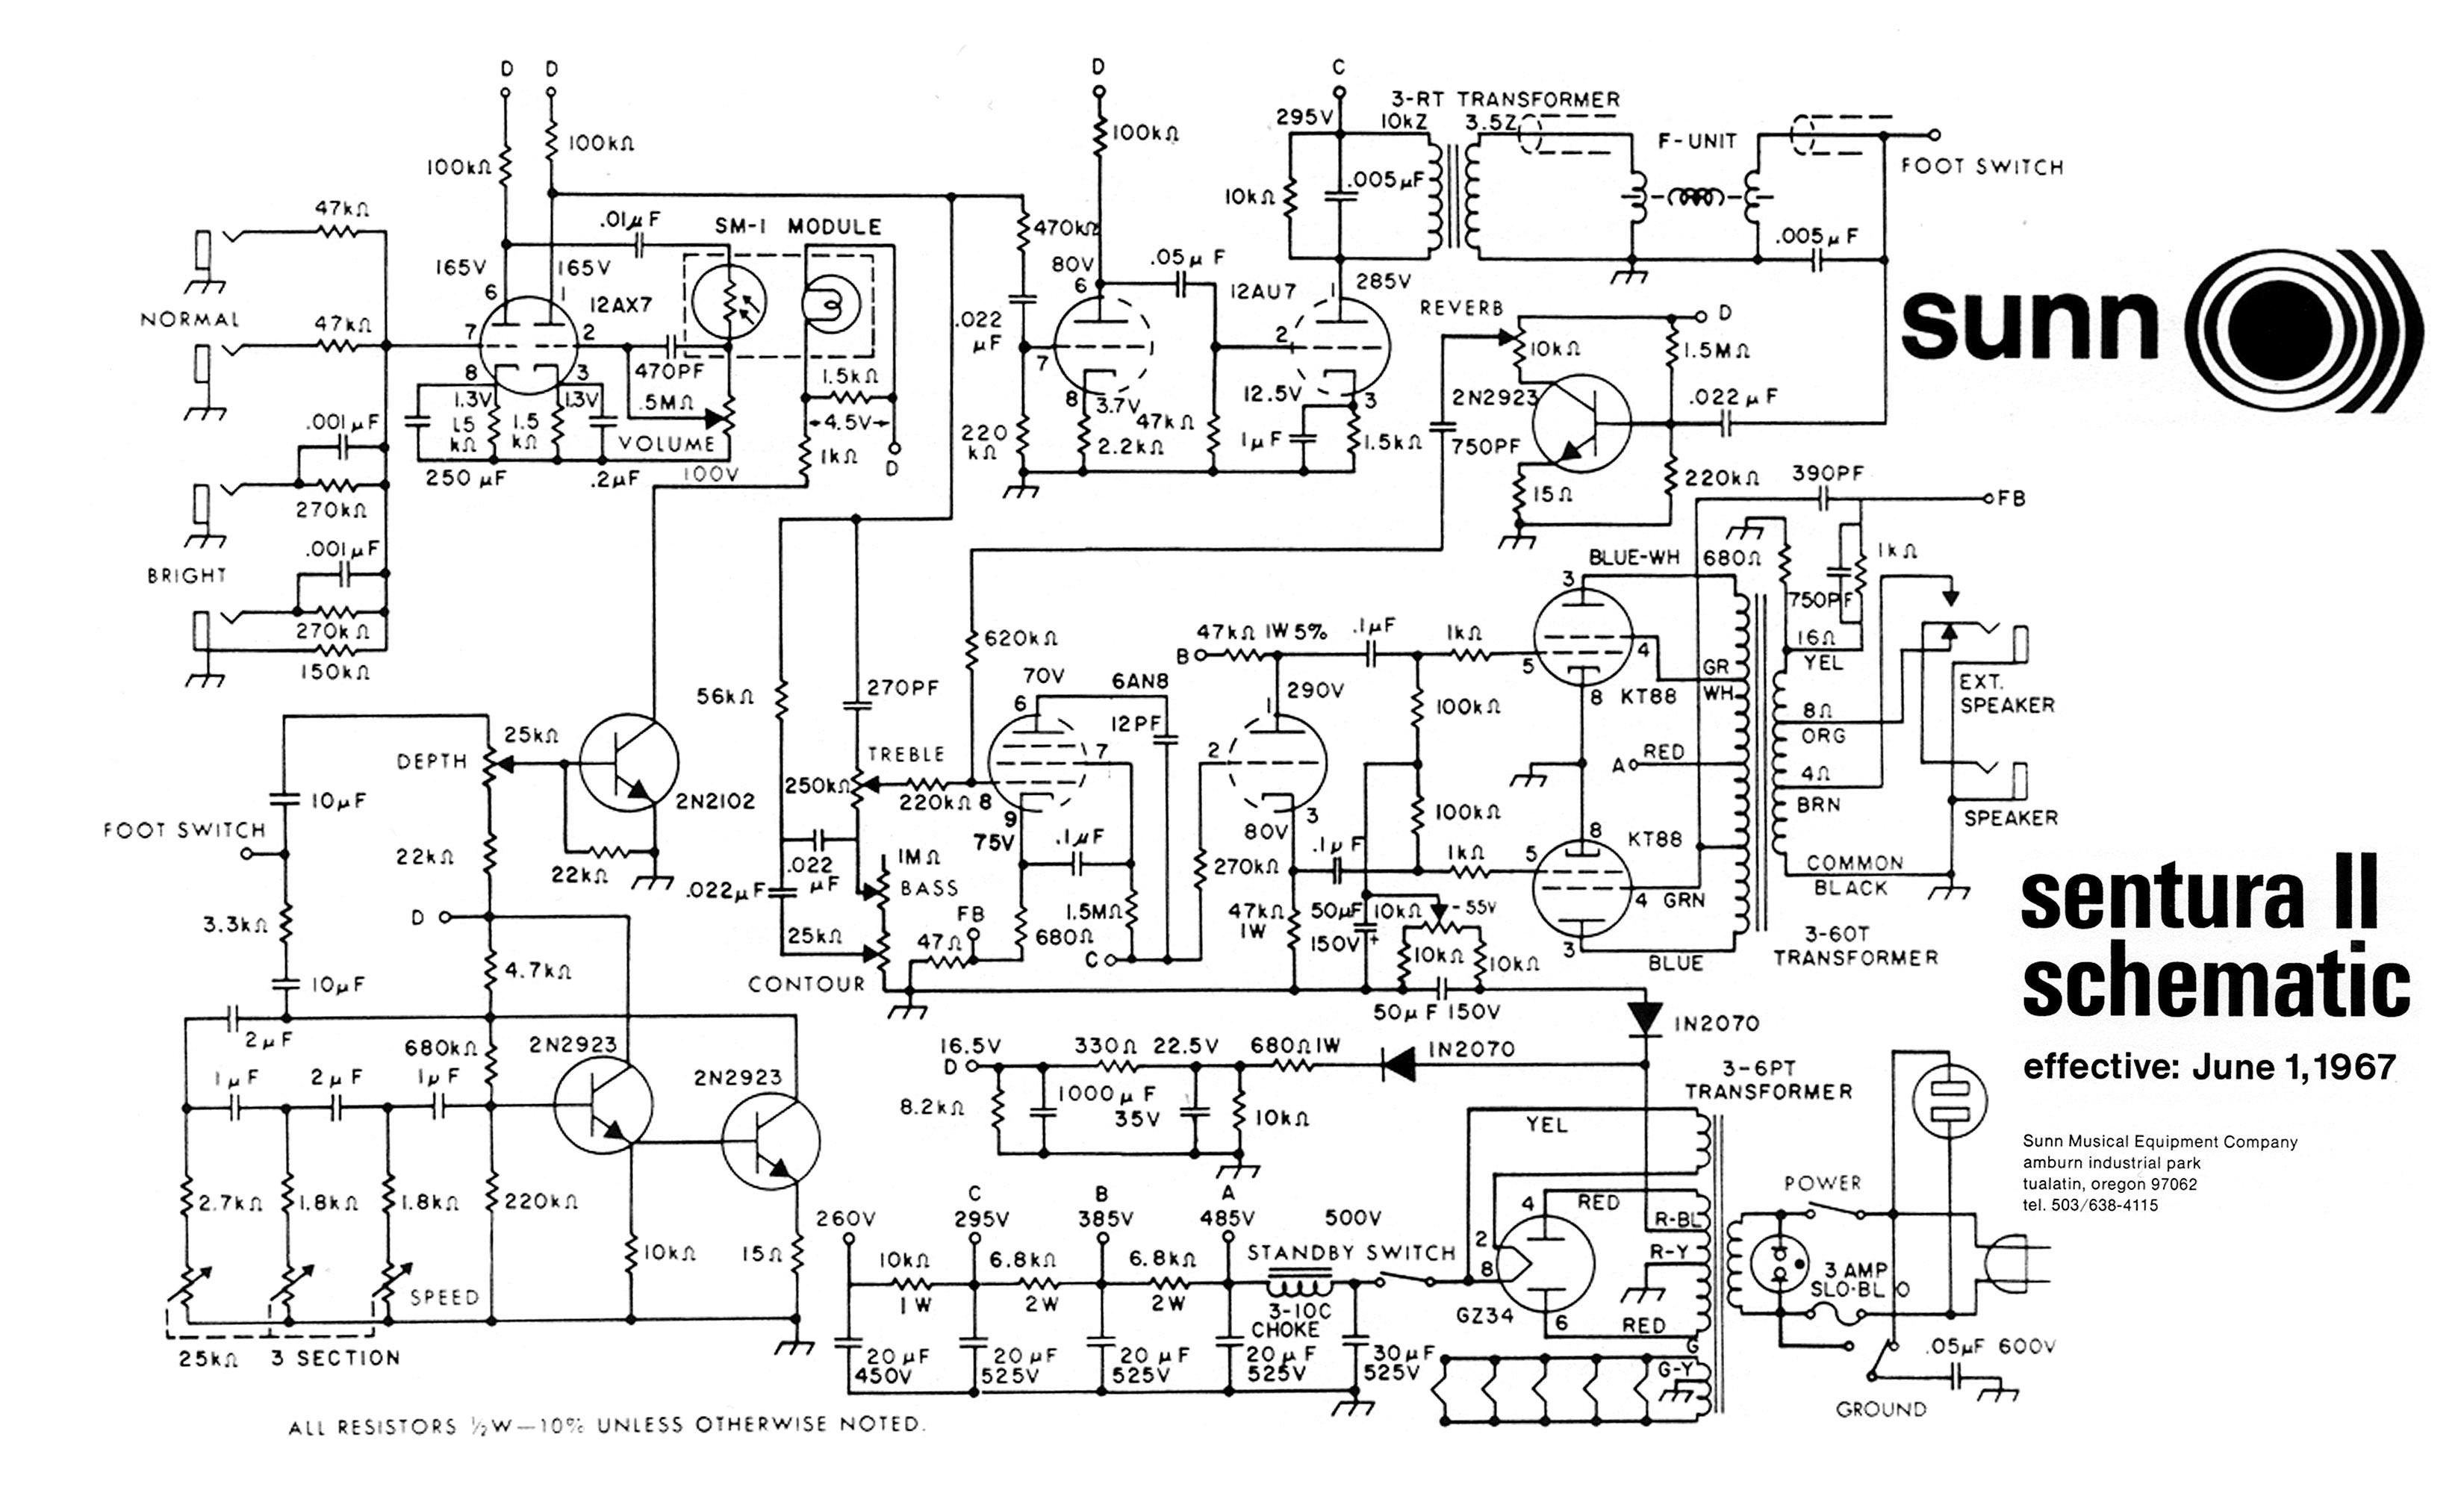 2000 cadillac deville ecm fuse box location free download wiring